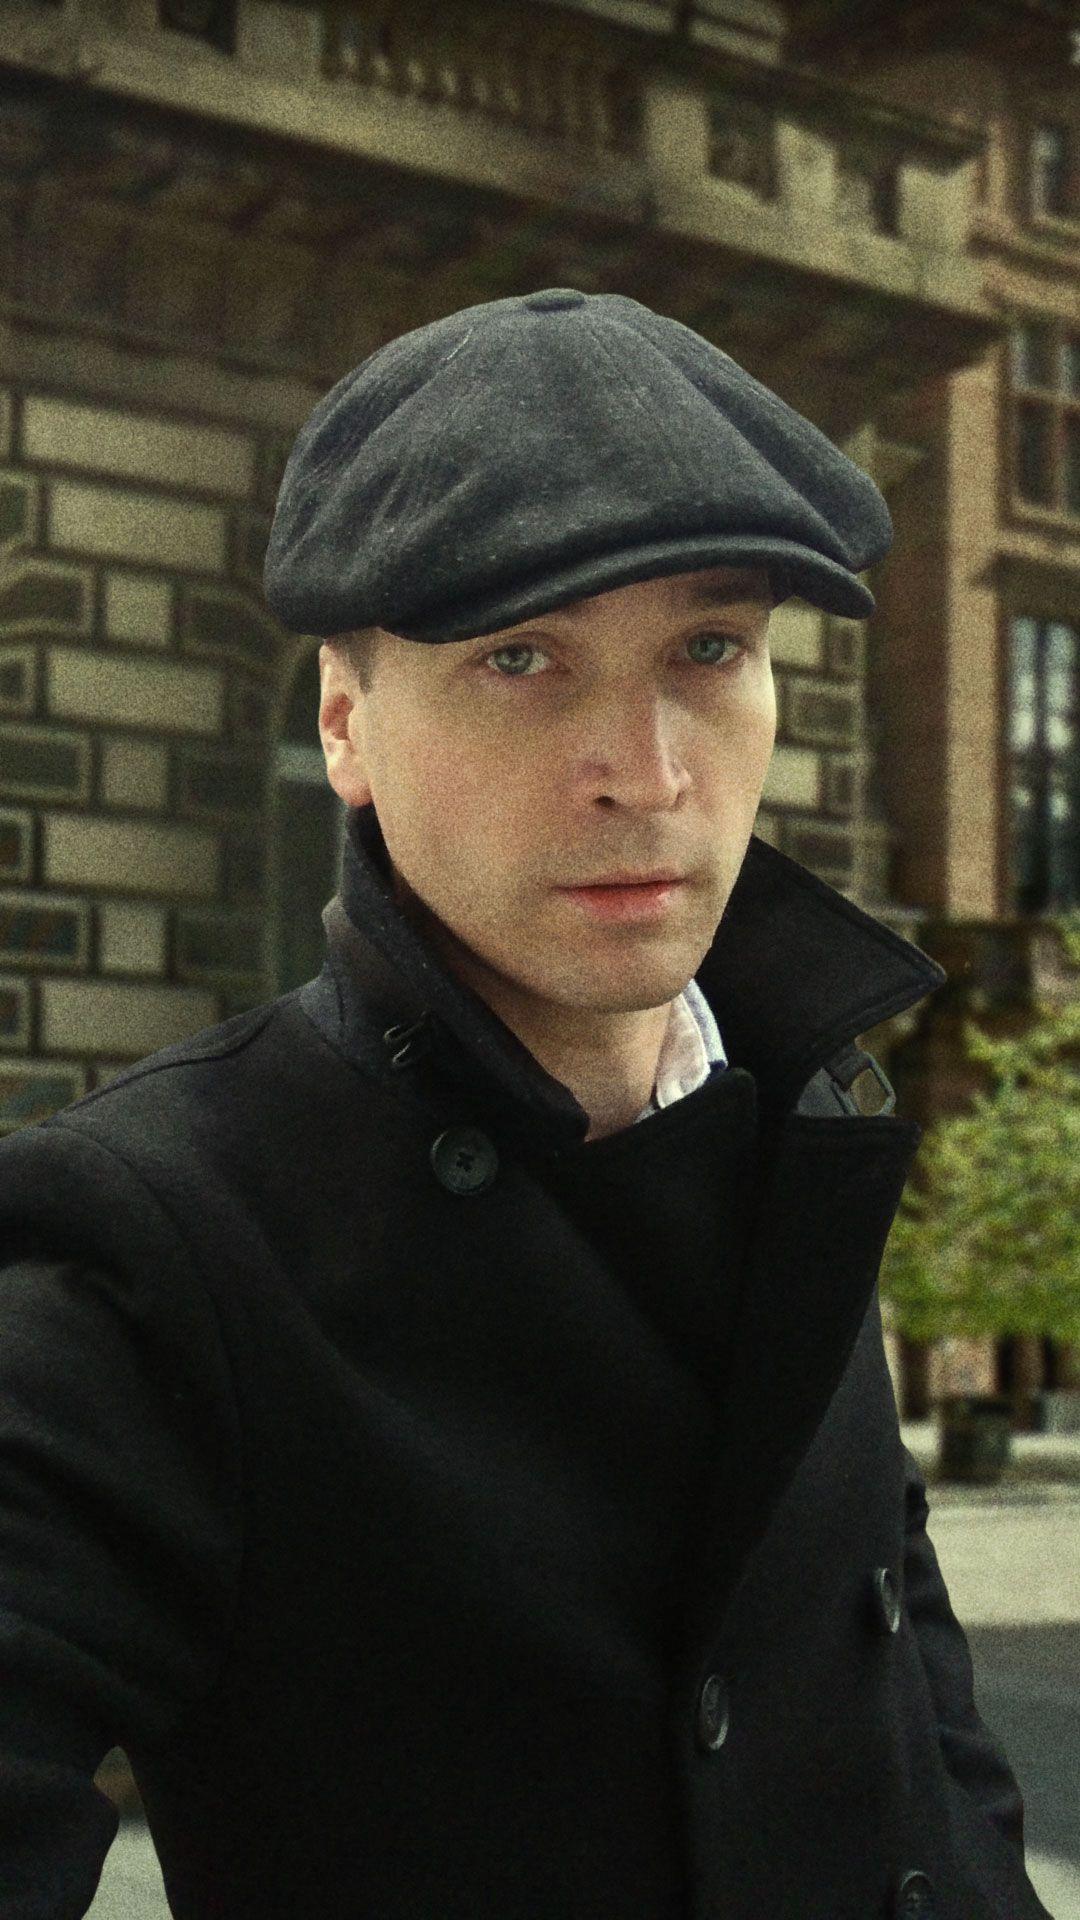 7bbd583b78000 Peaky Blinders style with baker boy cap in Glasgow